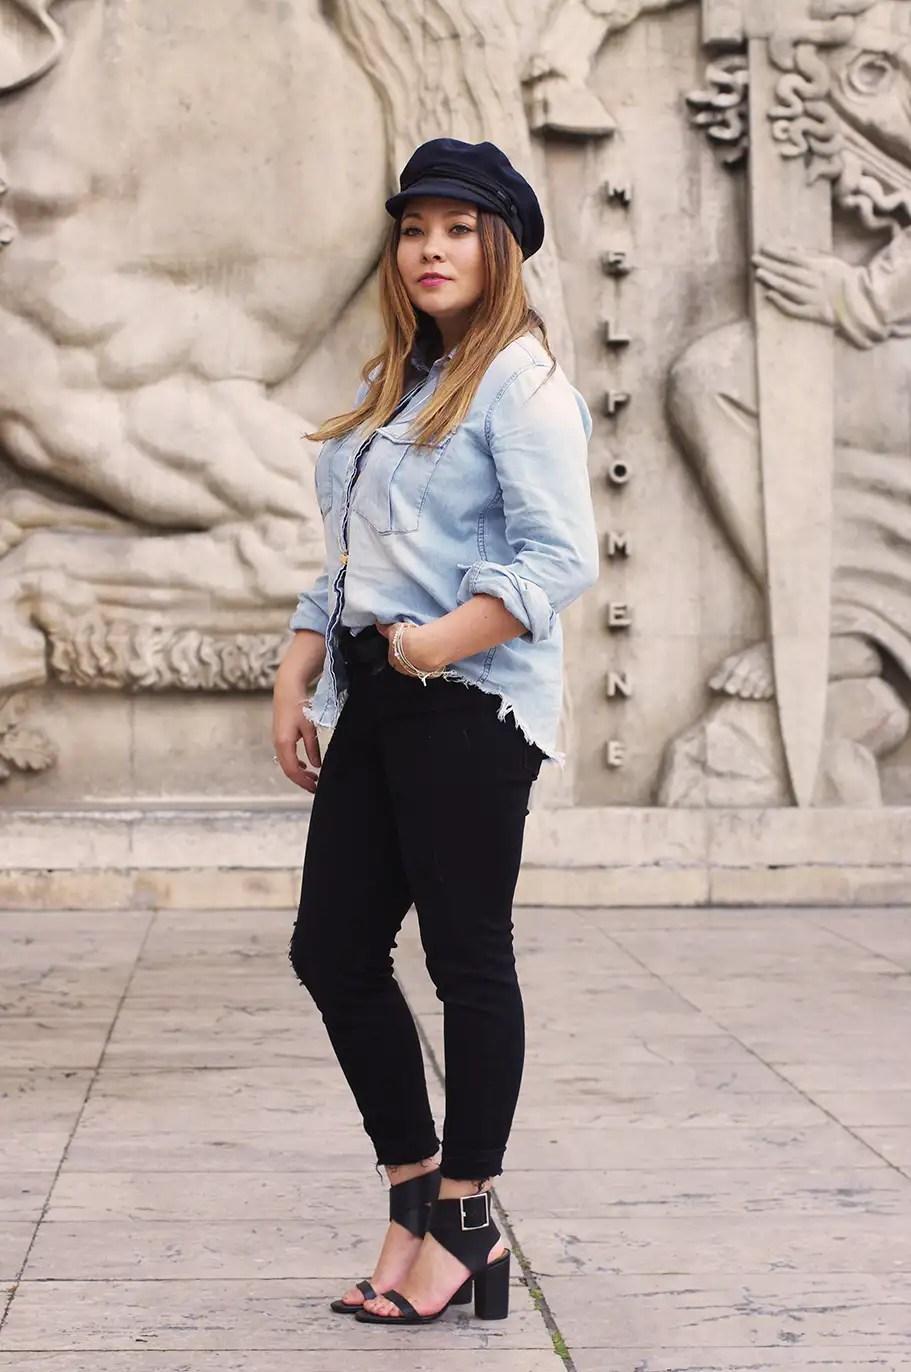 jeans & navy look